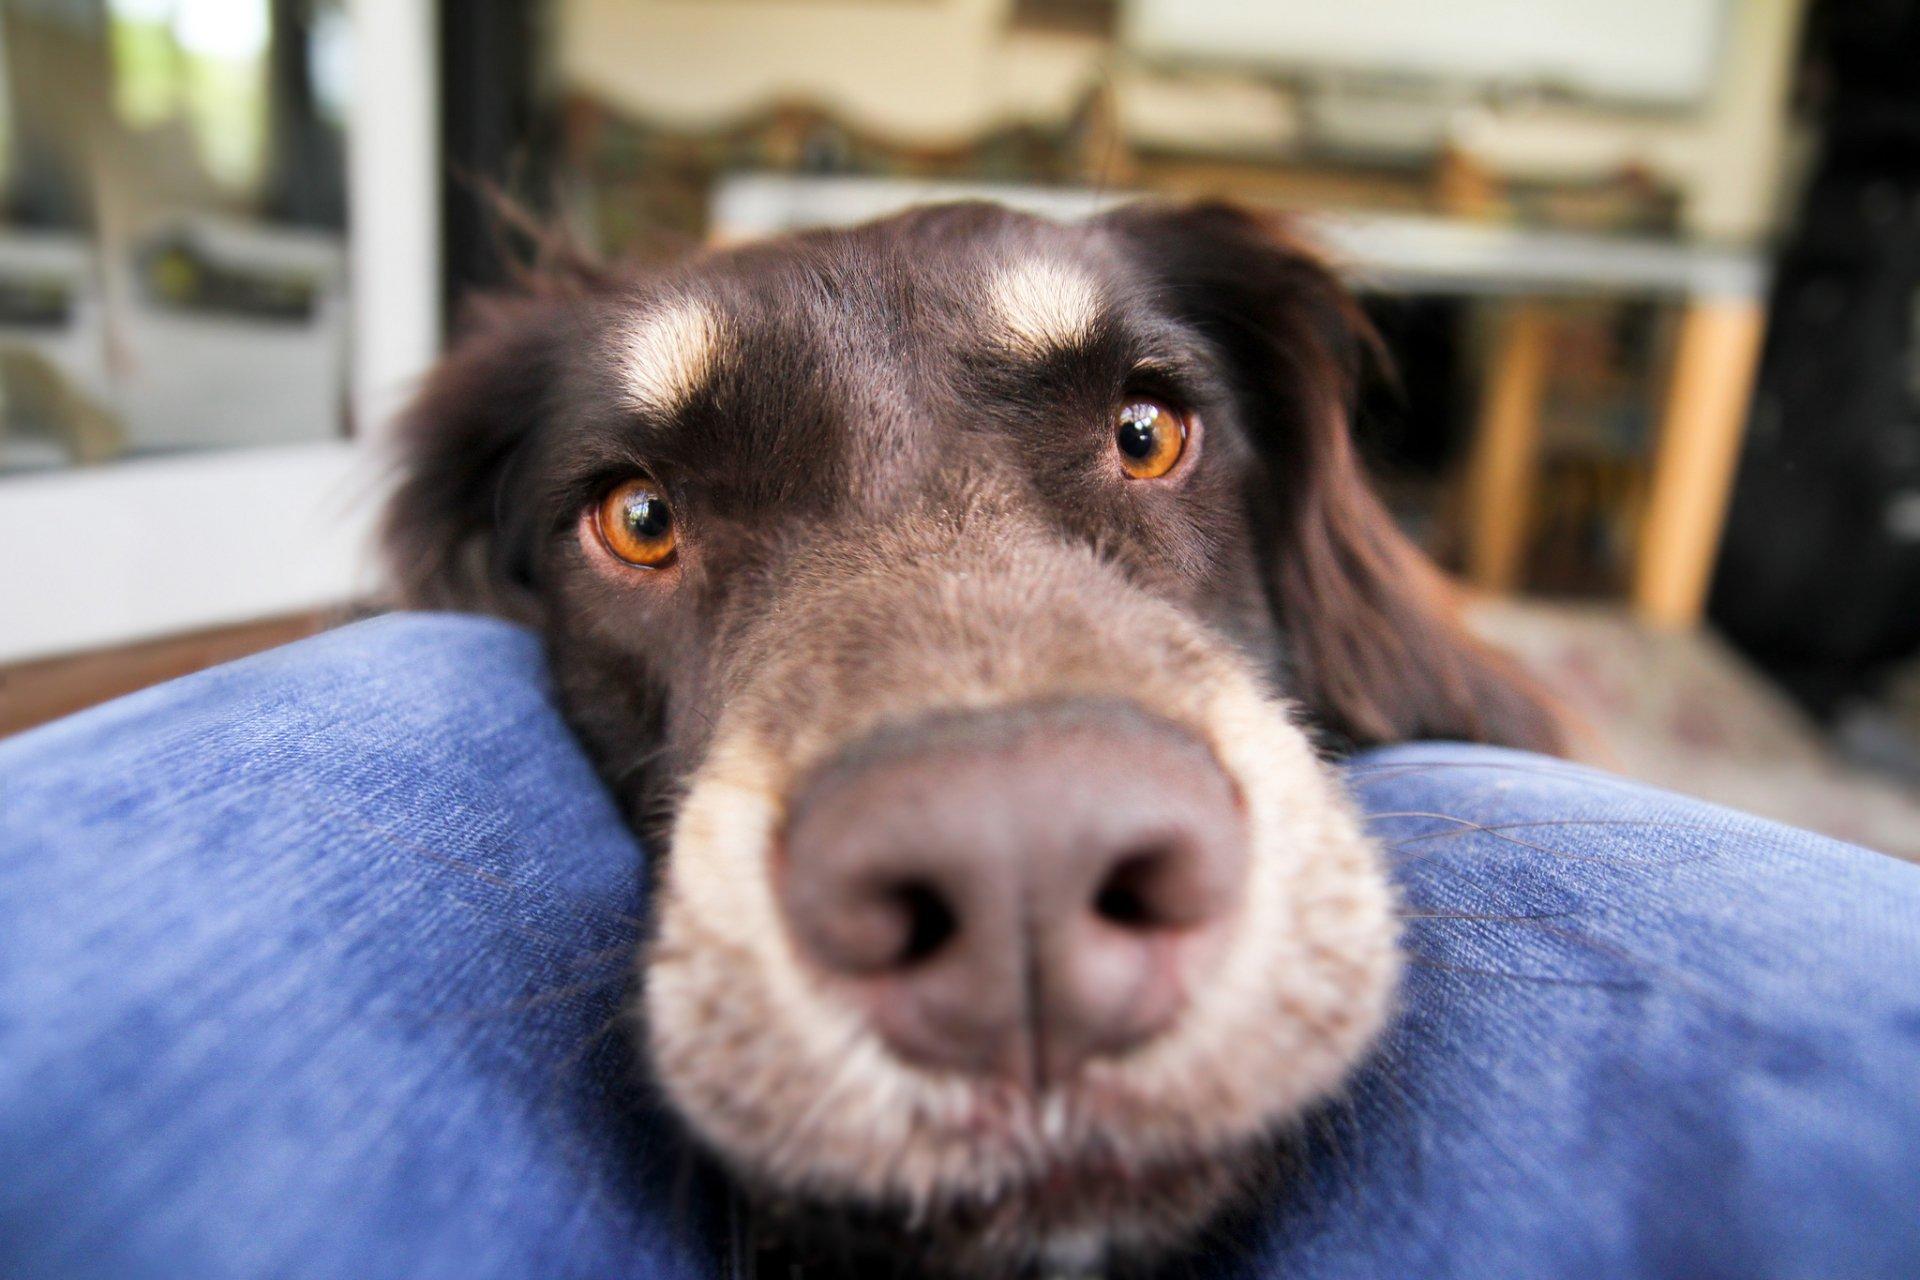 Animal - Australian Shepherd  Close-Up Dog Wallpaper